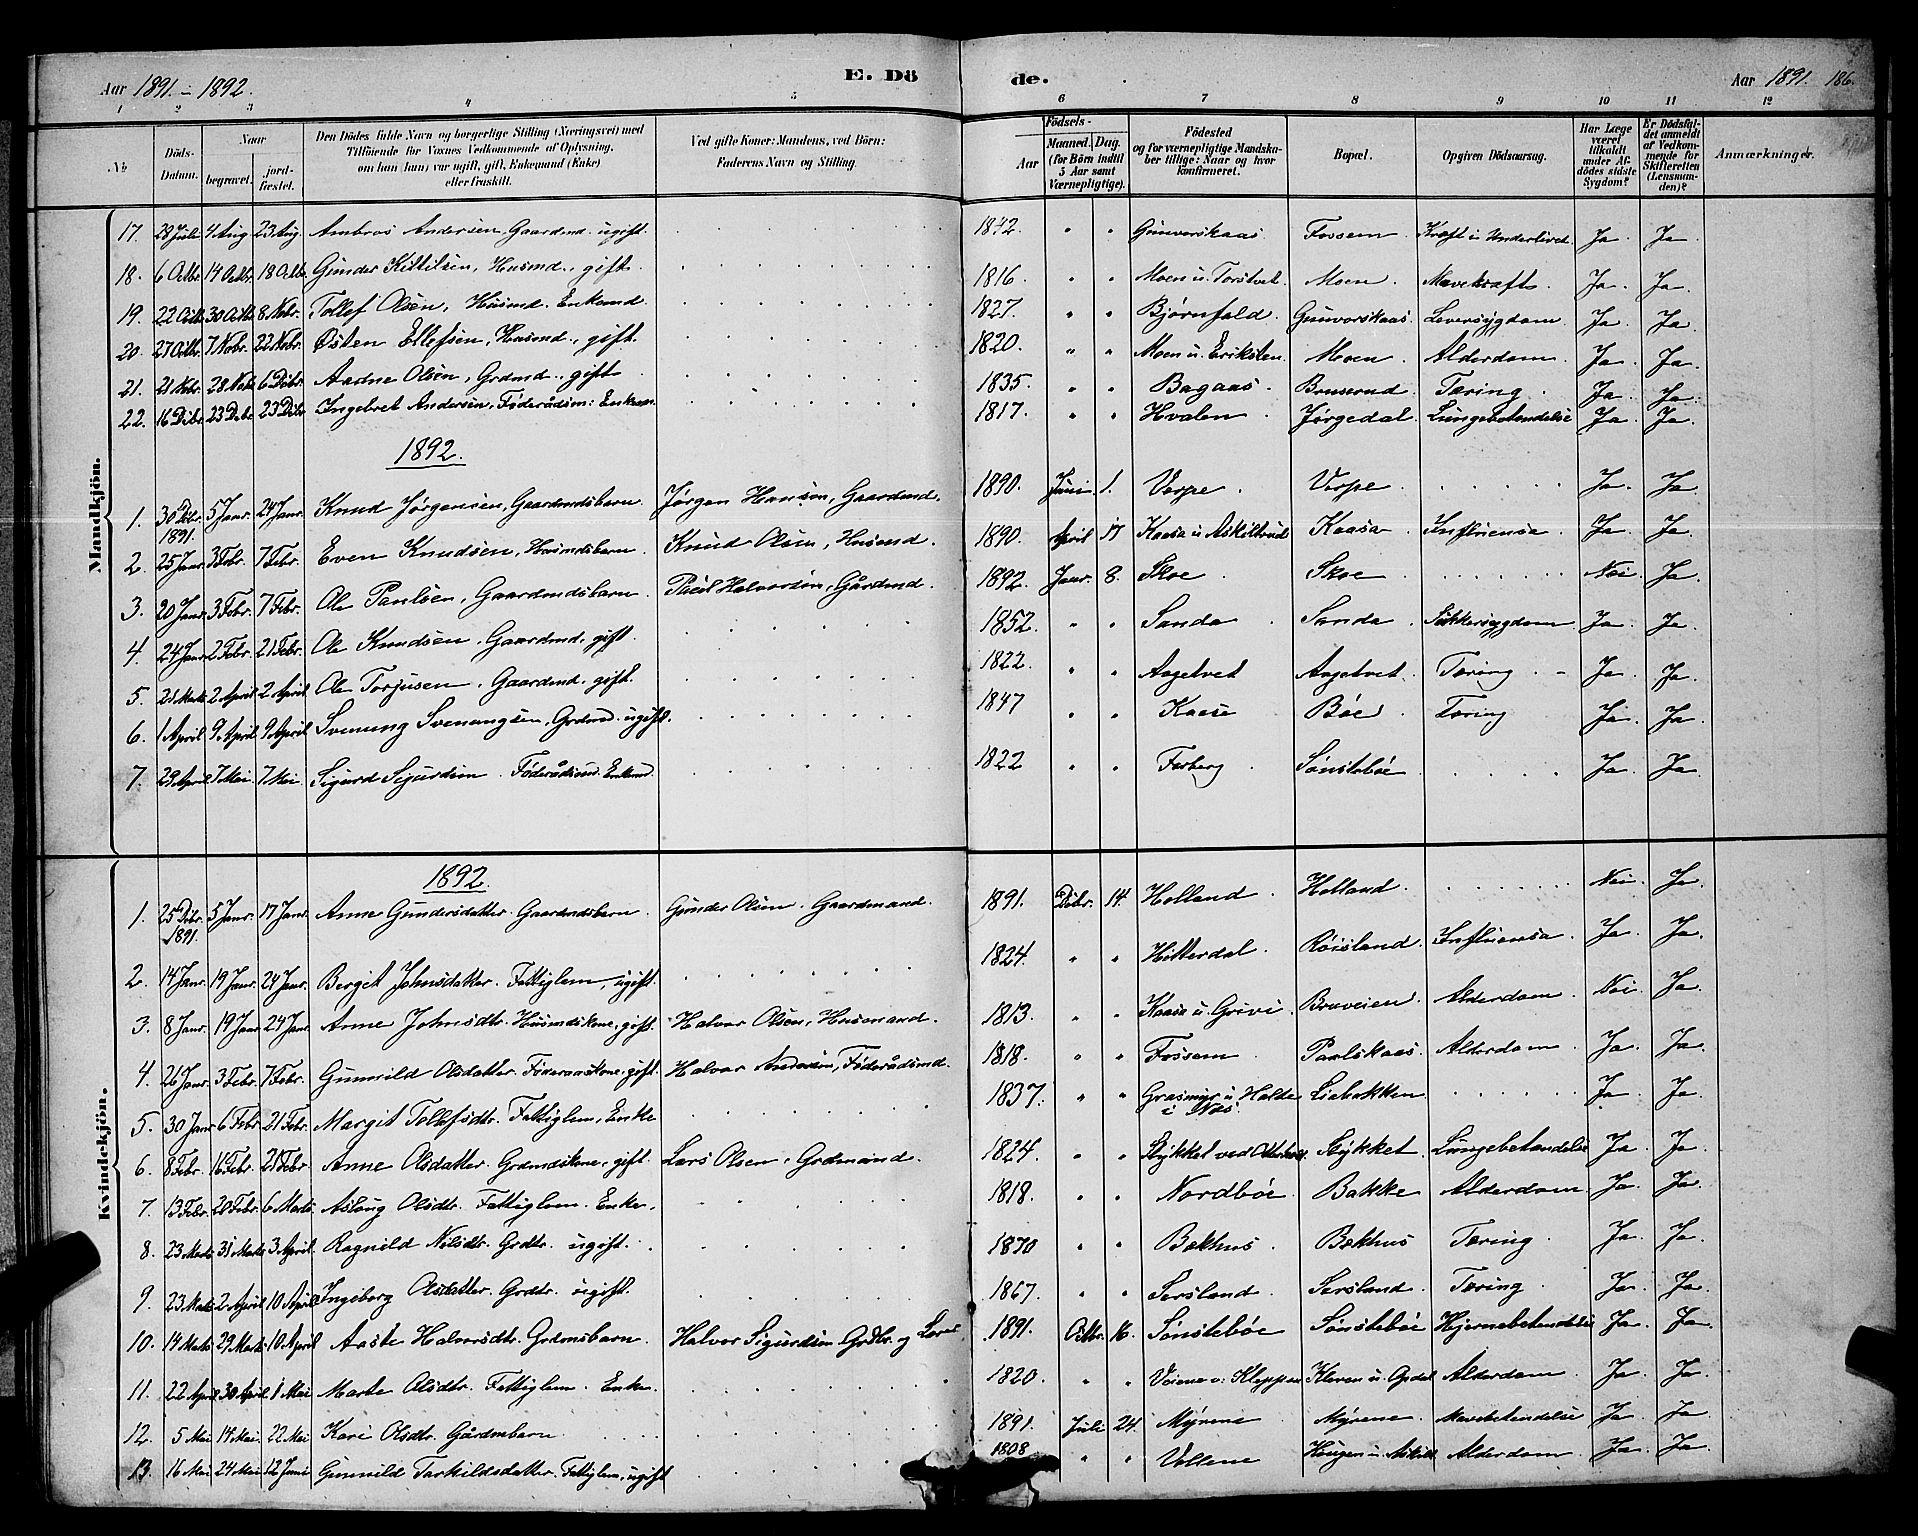 SAKO, Bø kirkebøker, G/Ga/L0005: Klokkerbok nr. 5, 1883-1897, s. 186